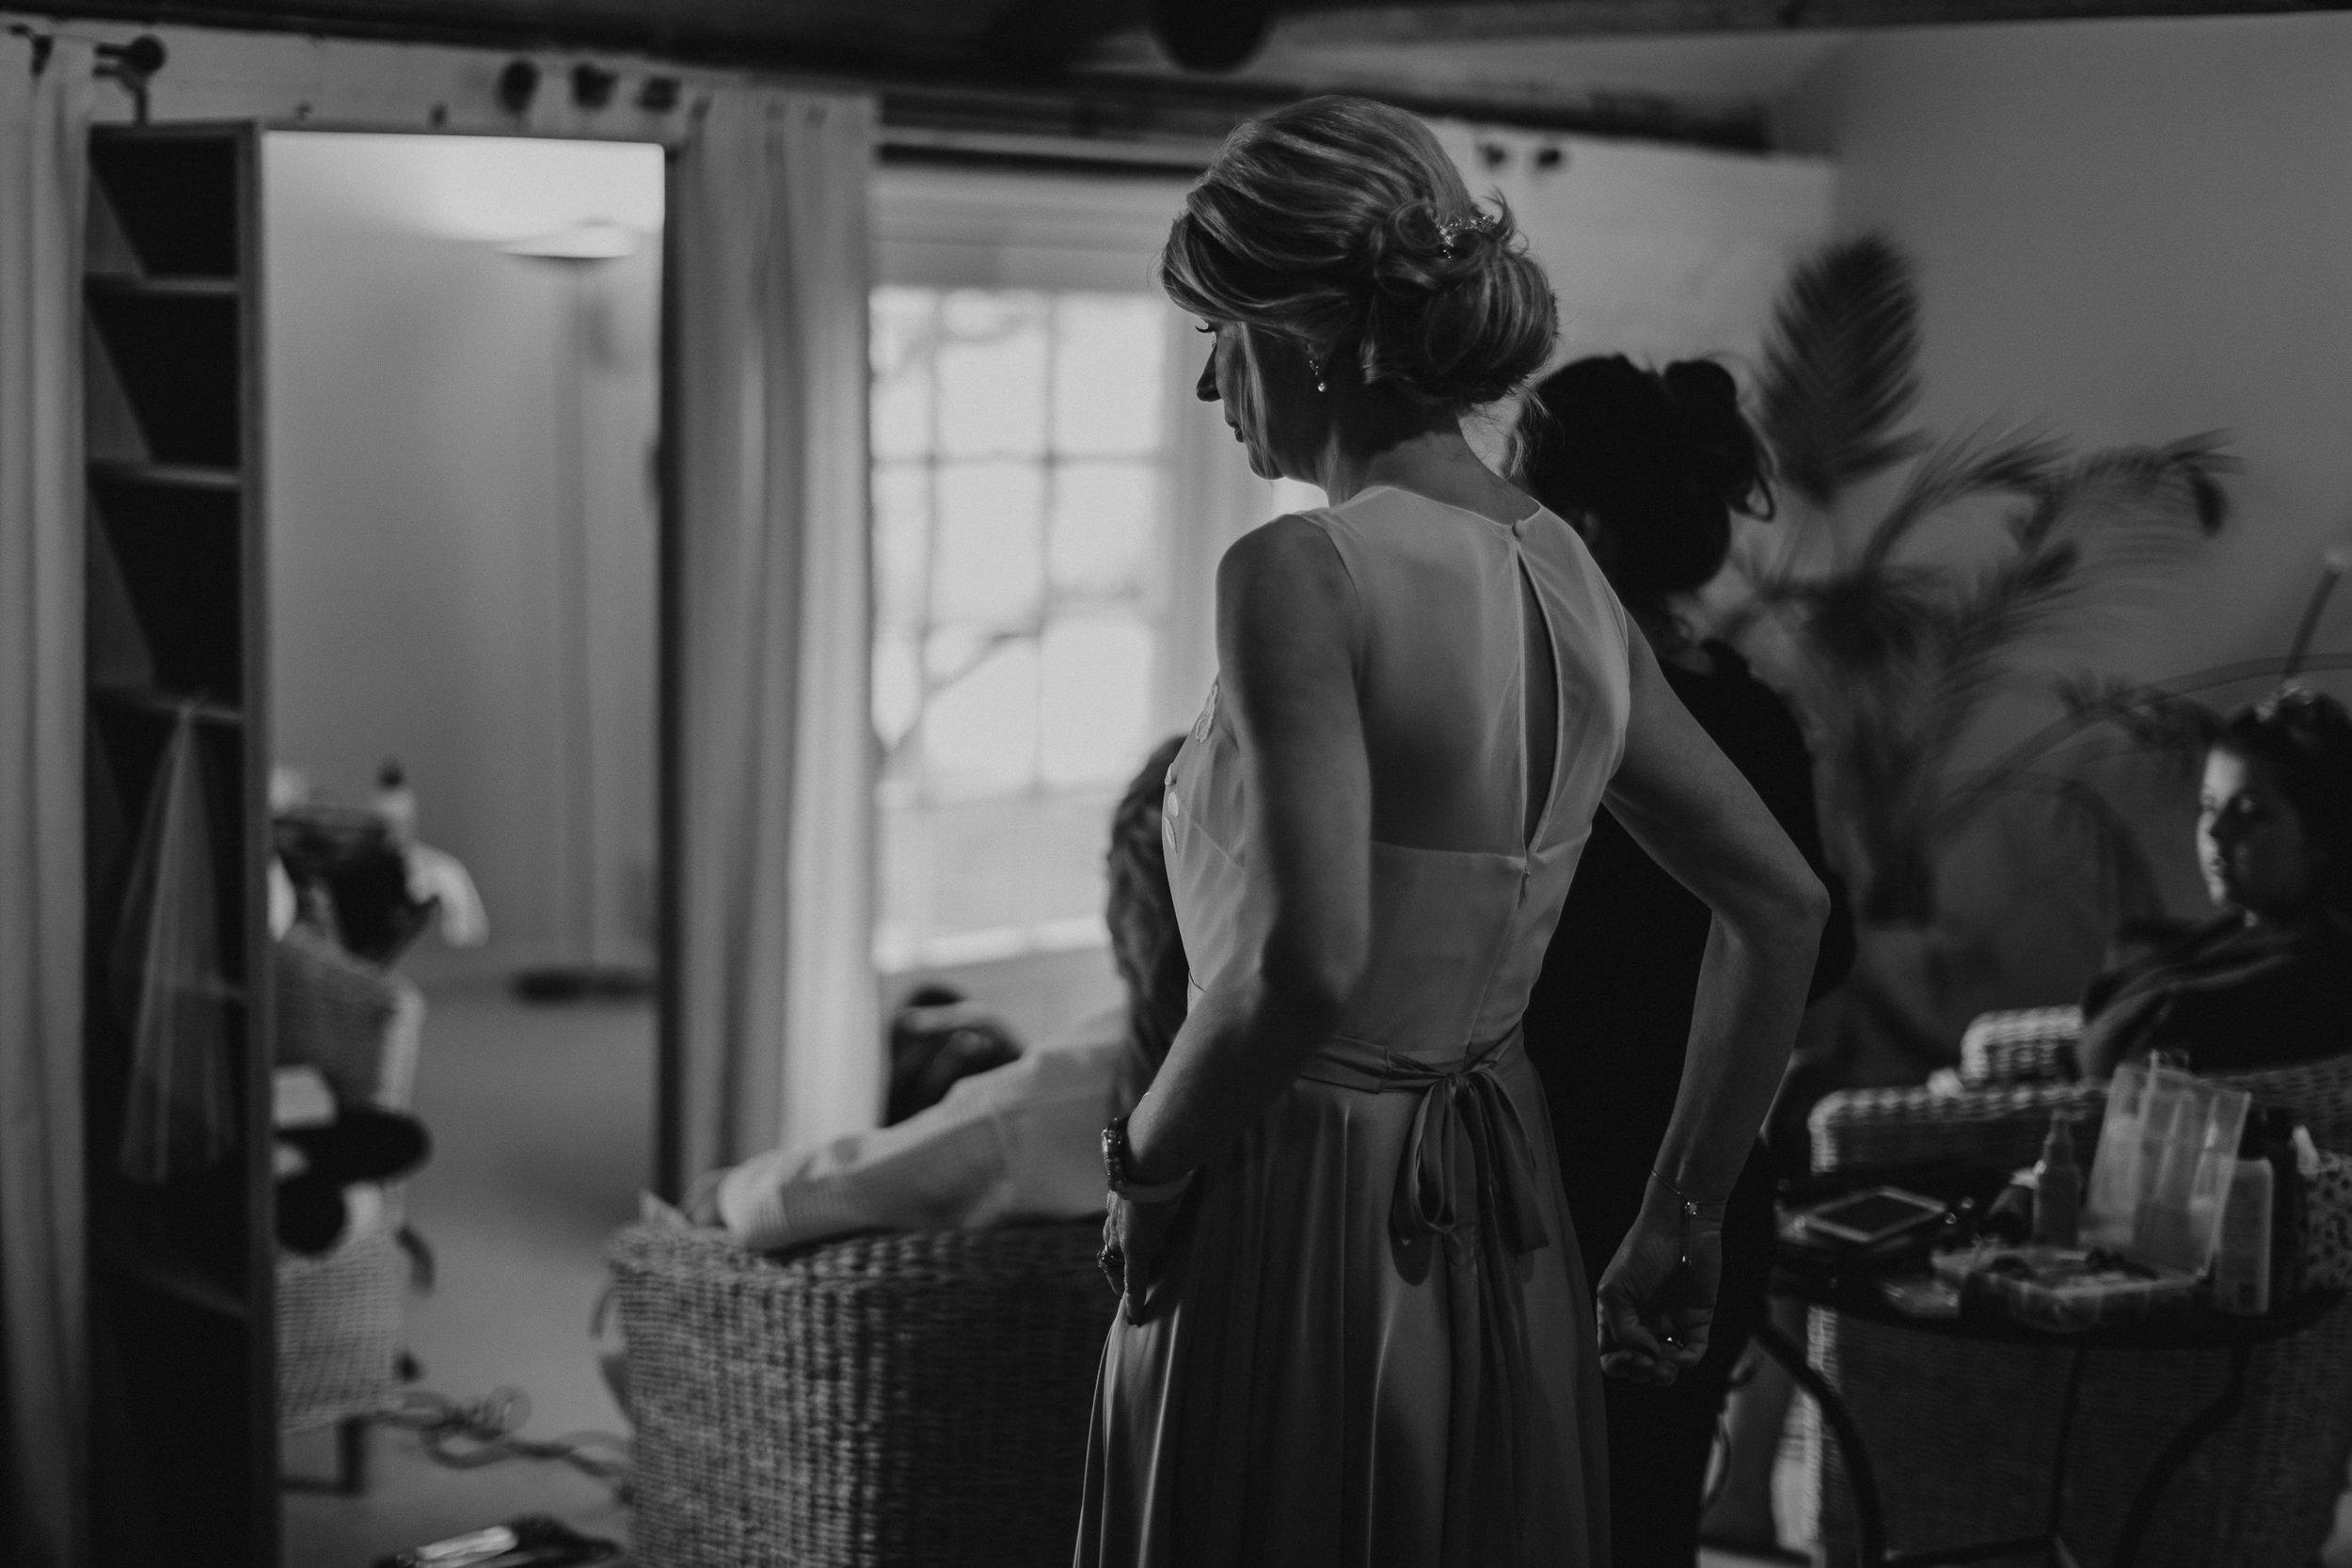 London_wedding_photographer_gione_da_silva_carelle_paul44.jpg